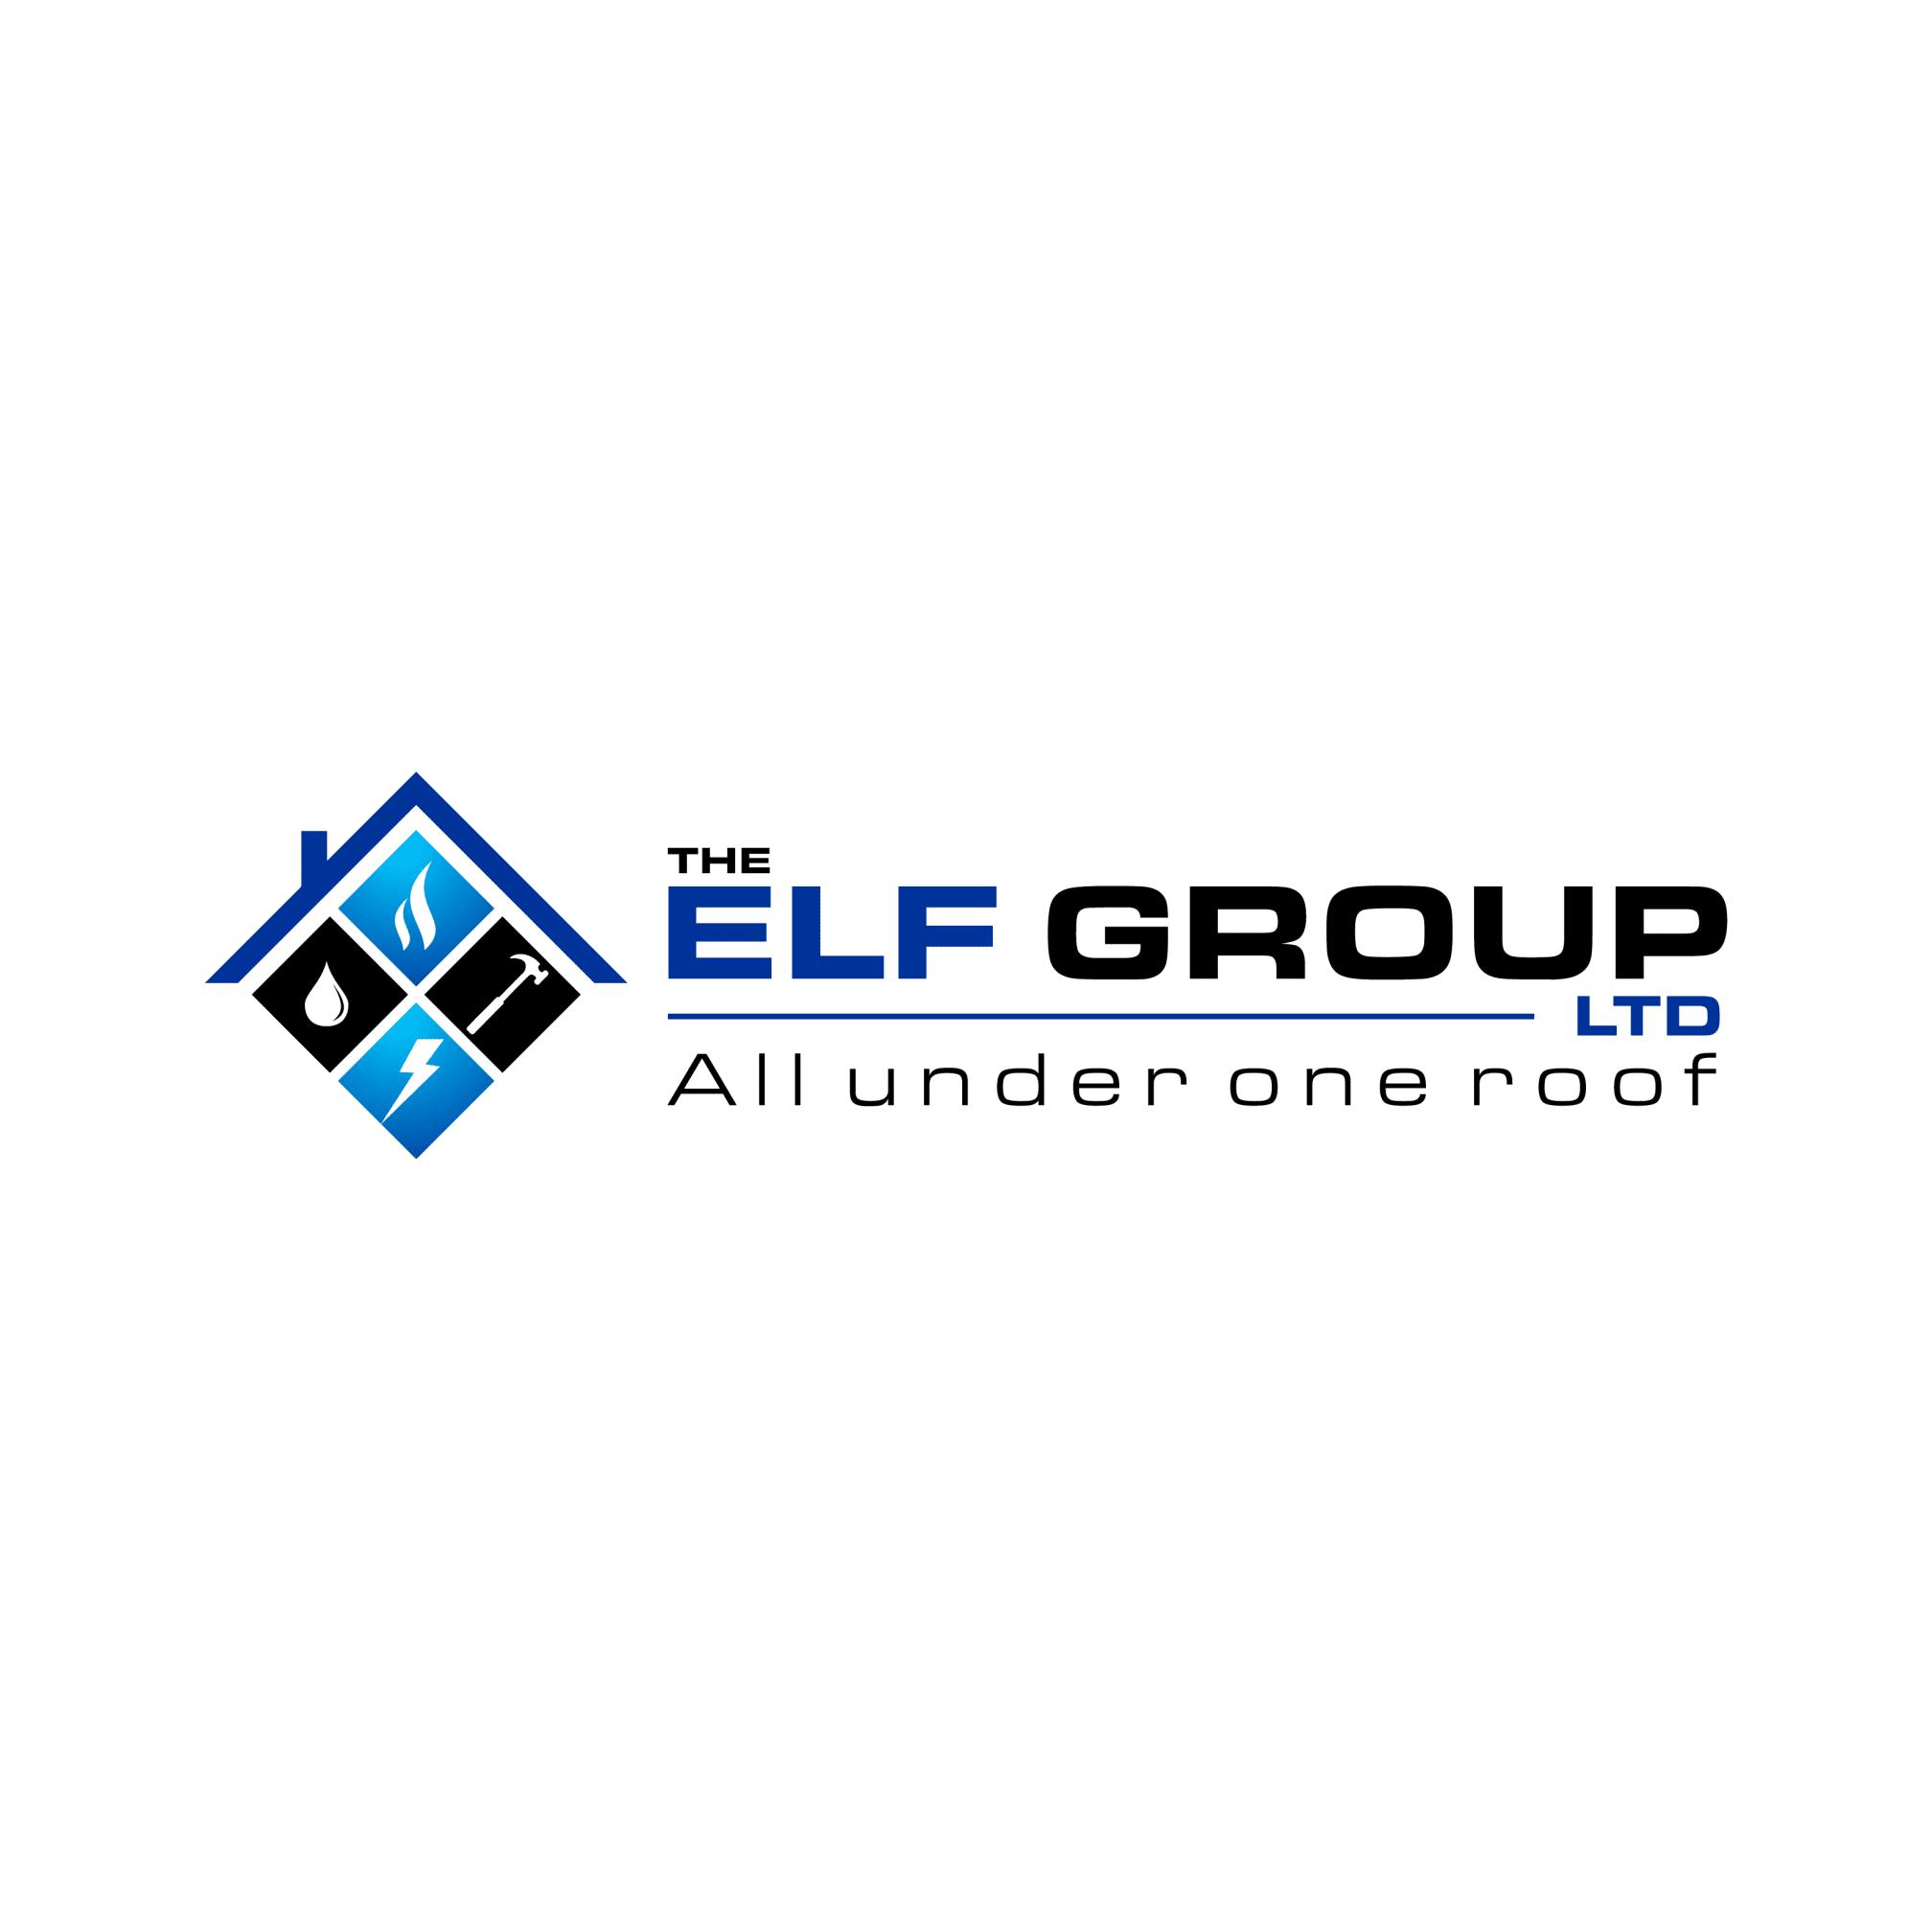 The Elf Group Ltd - Milton Keynes, Buckinghamshire MK13 8AL - 01908 229928 | ShowMeLocal.com